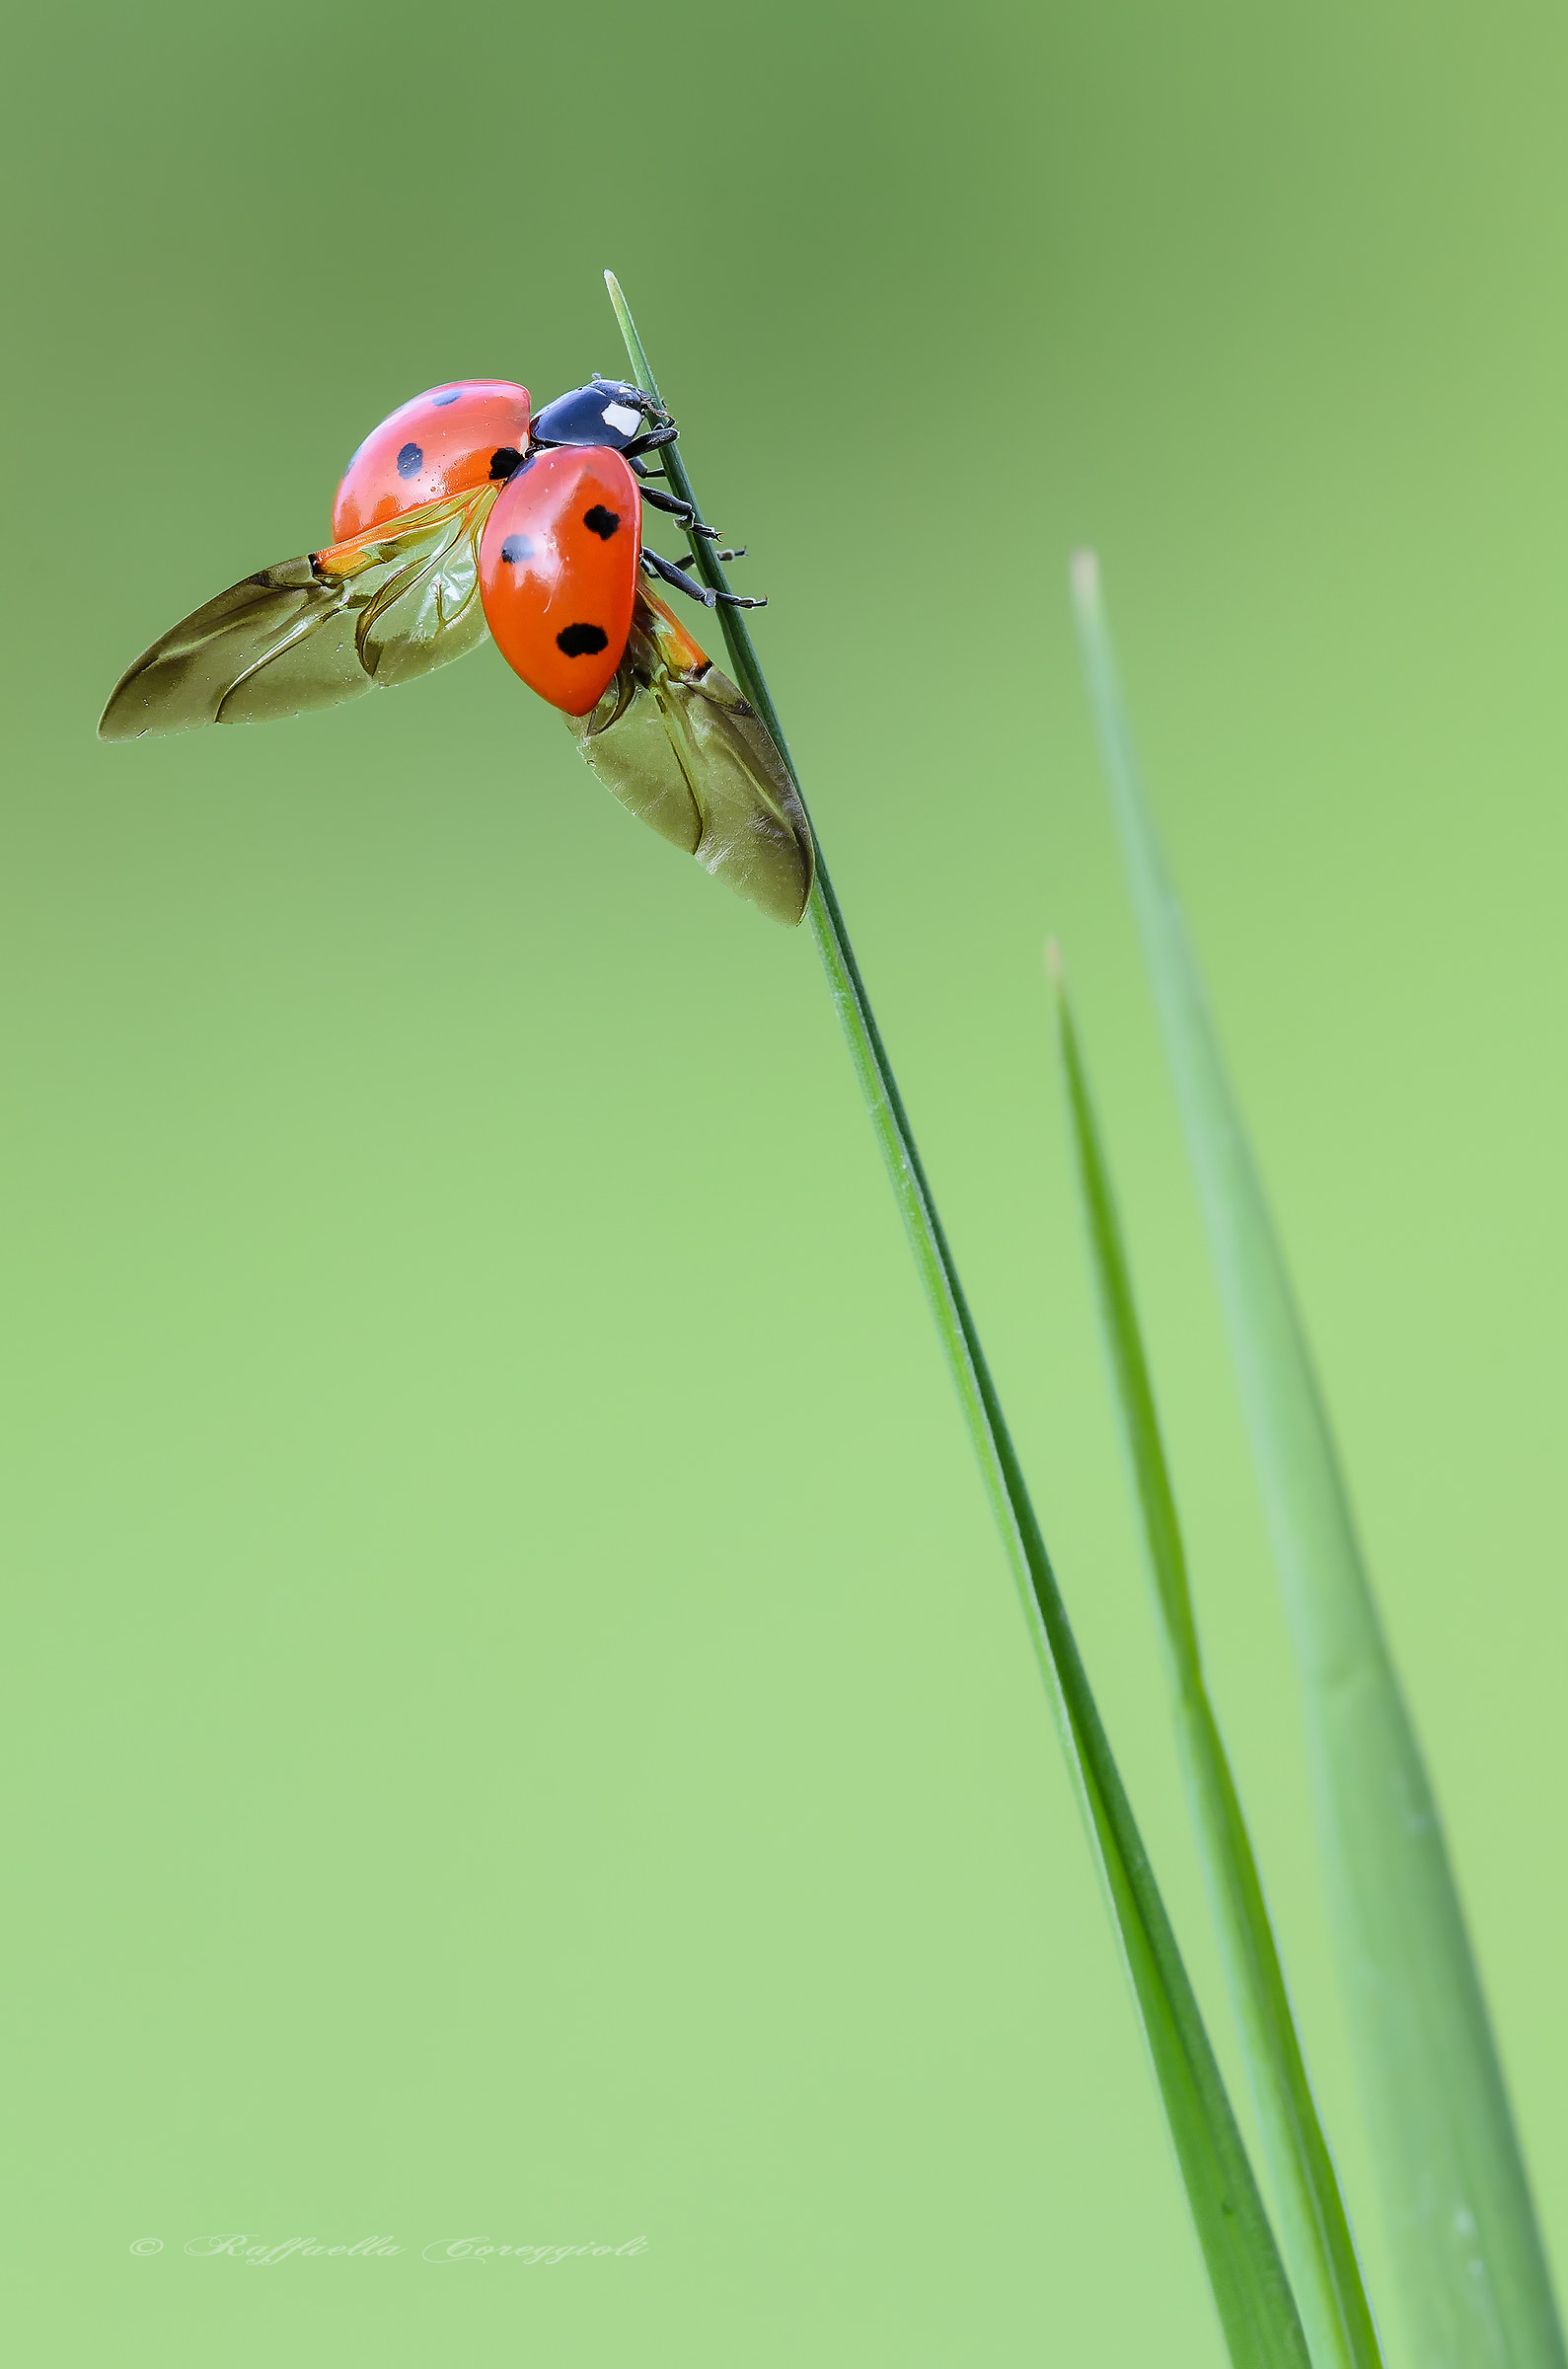 Lap dances of Ladybug...